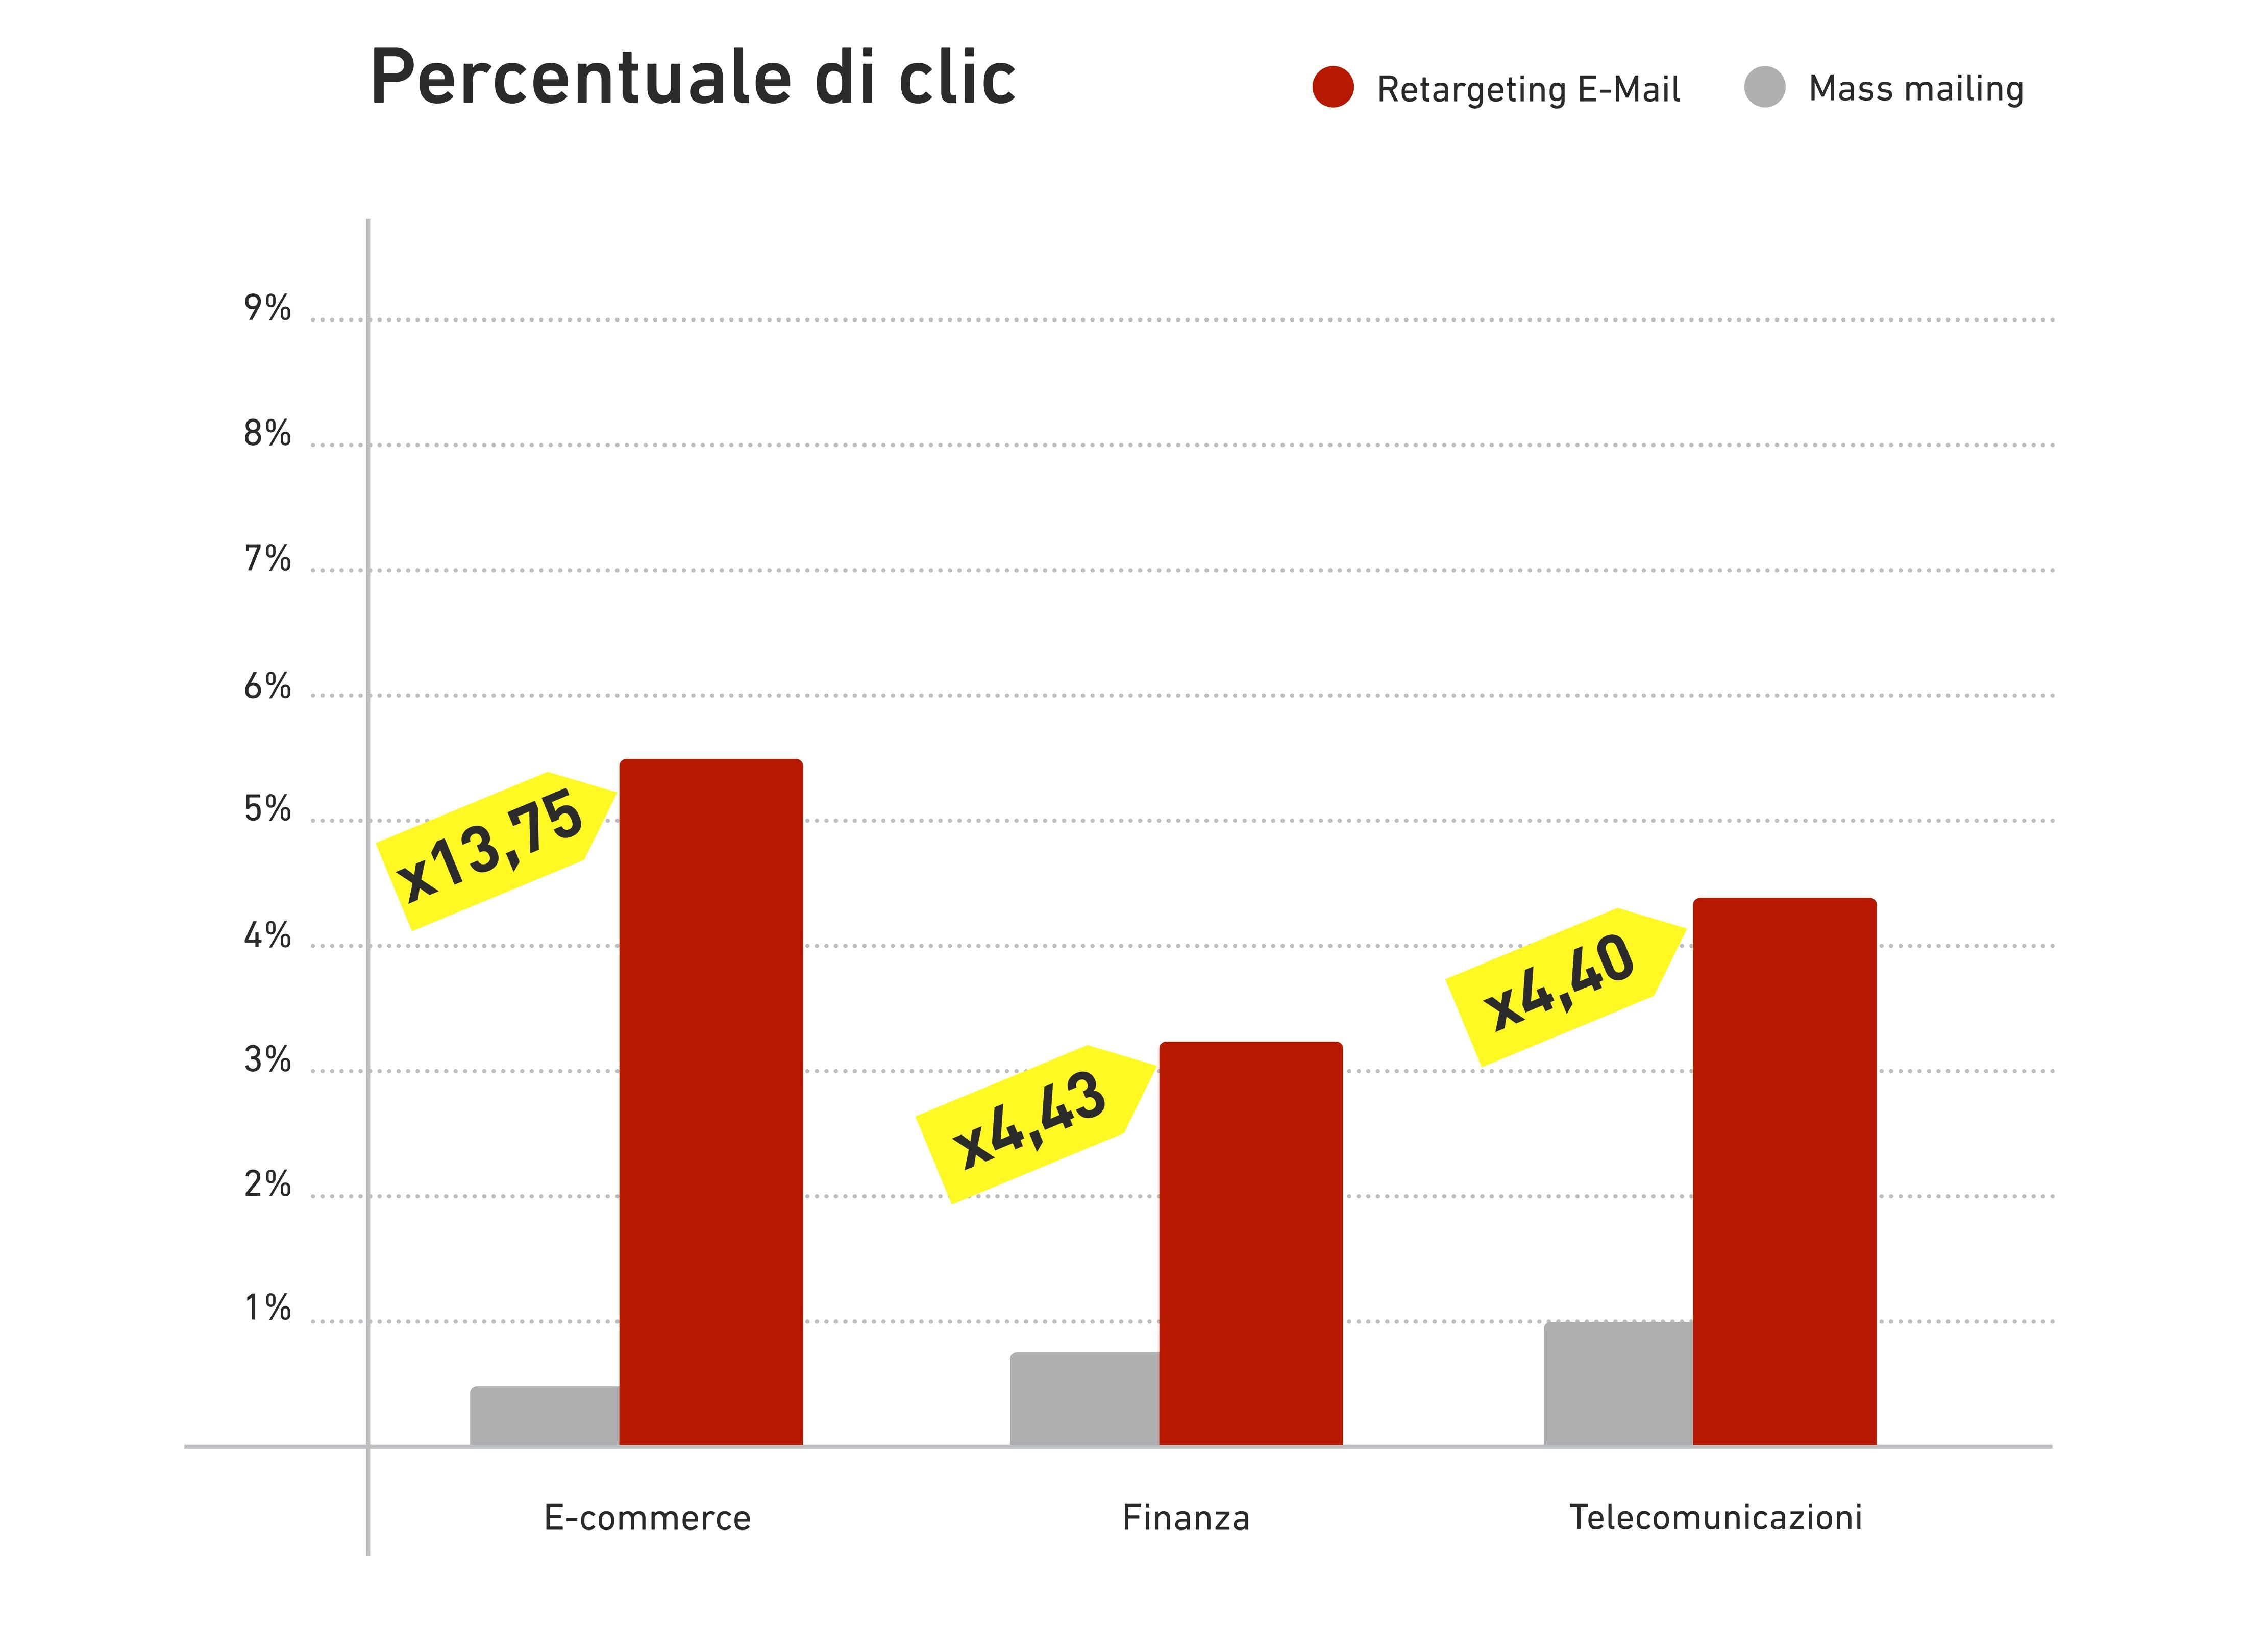 e-mail ReTargeting: percentuale di clic fino a 14 volte oltre i classici mailing